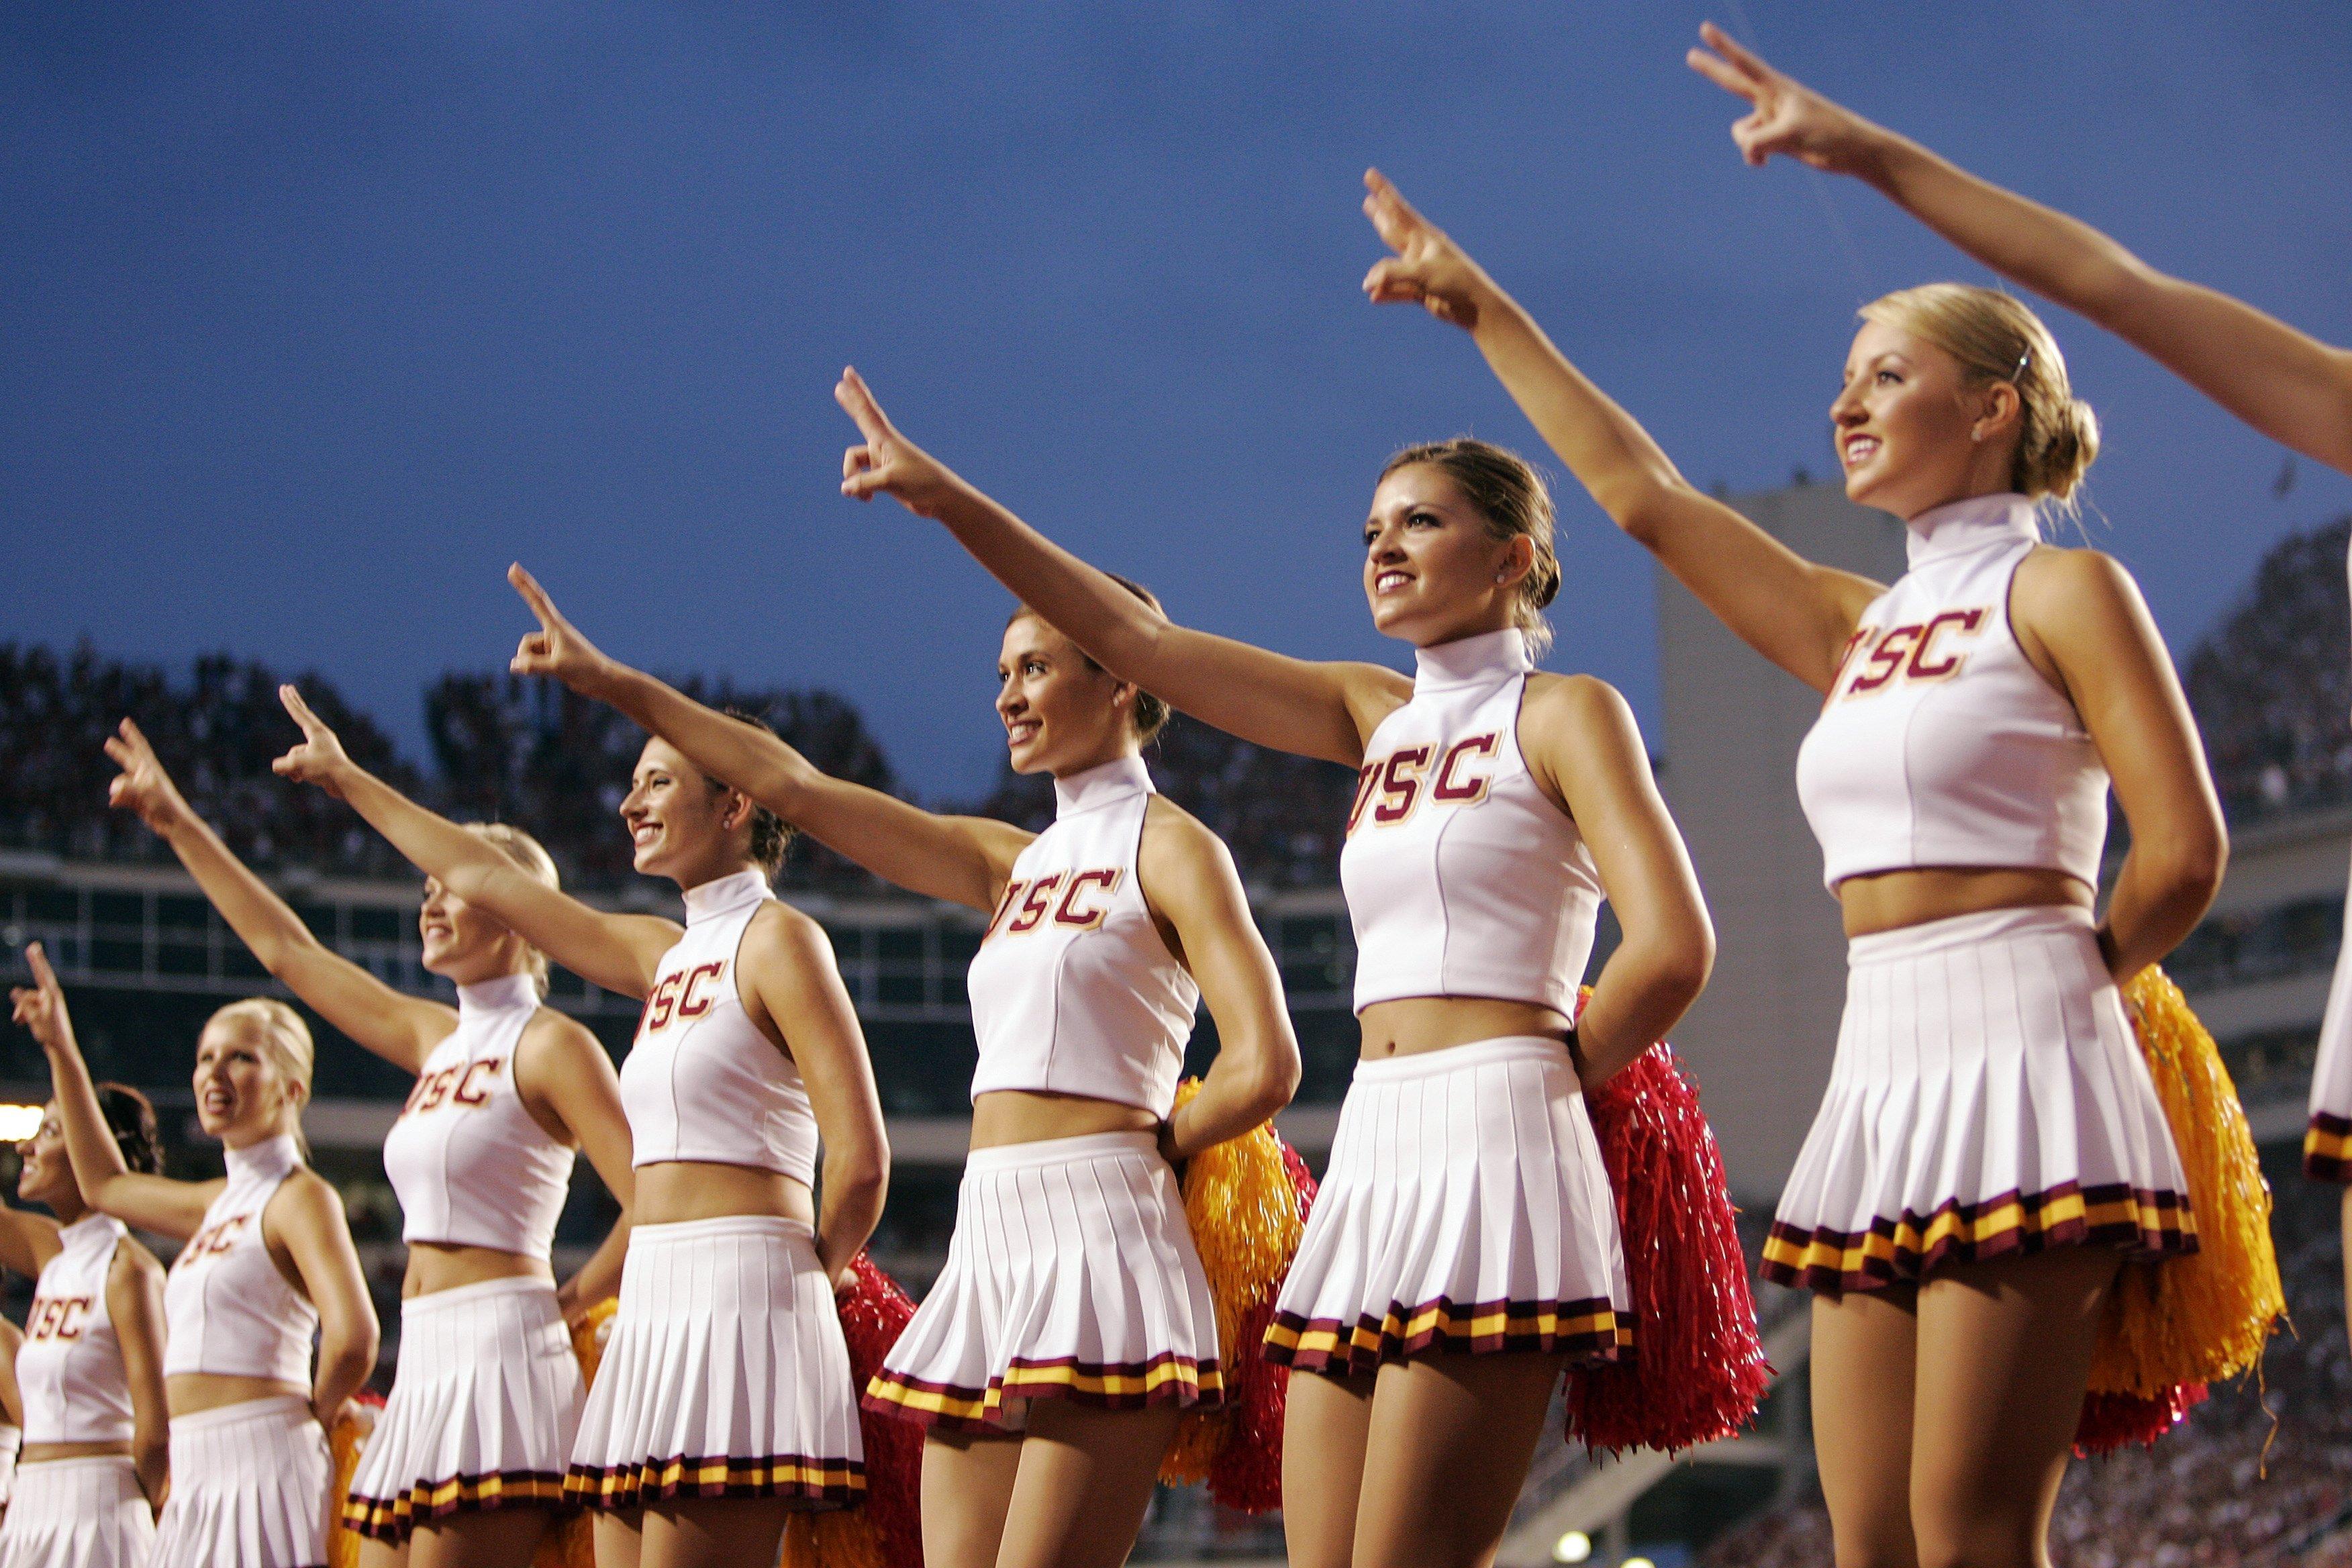 College football cheerleader gk wallpaper 3504x2336 159682 3504x2336